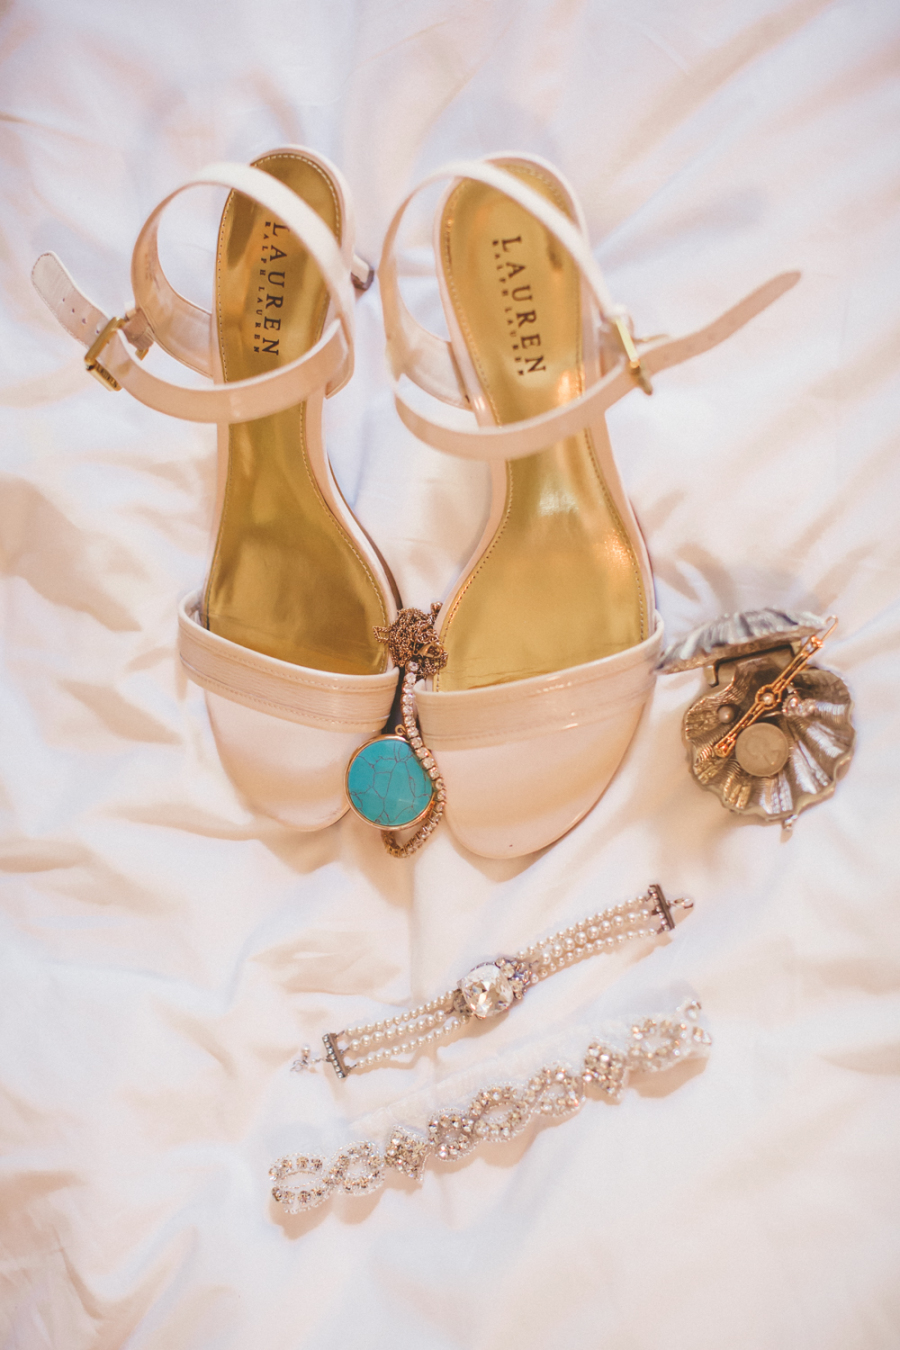 www.santabarbarawedding.com | Ann Johnson Events | Jessica Lewis | The Biltmore | Bride's Accessories